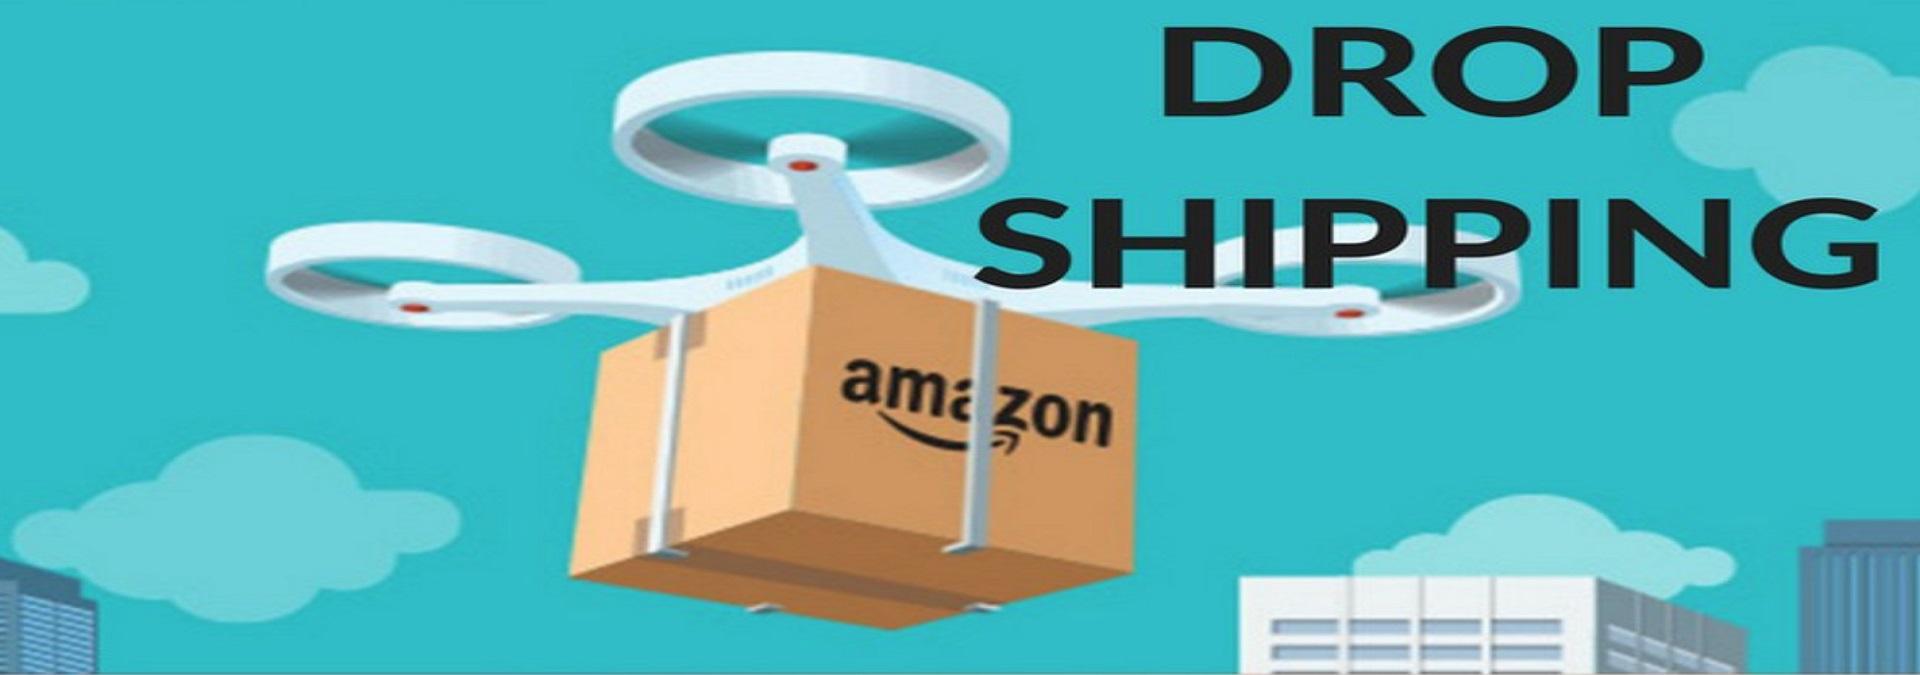 Dropshipping on Amazon